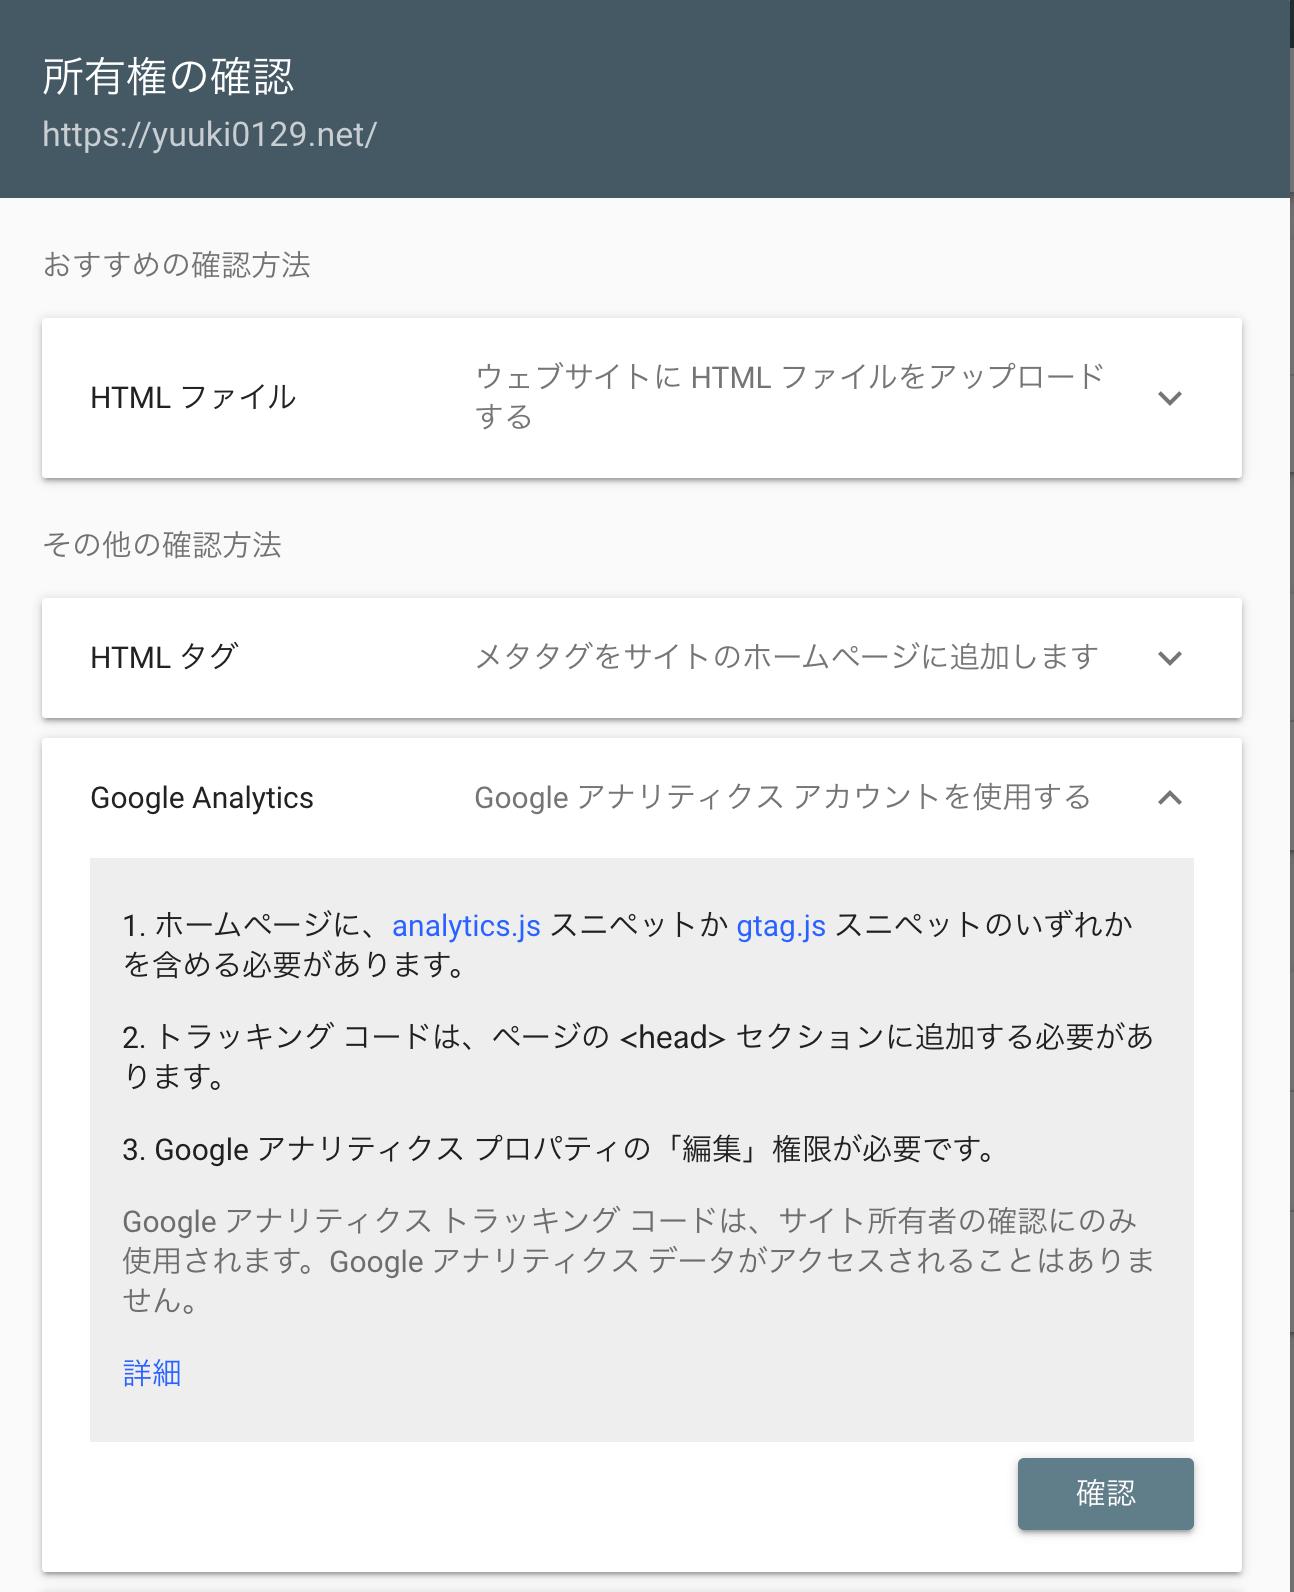 『Google Analytics』